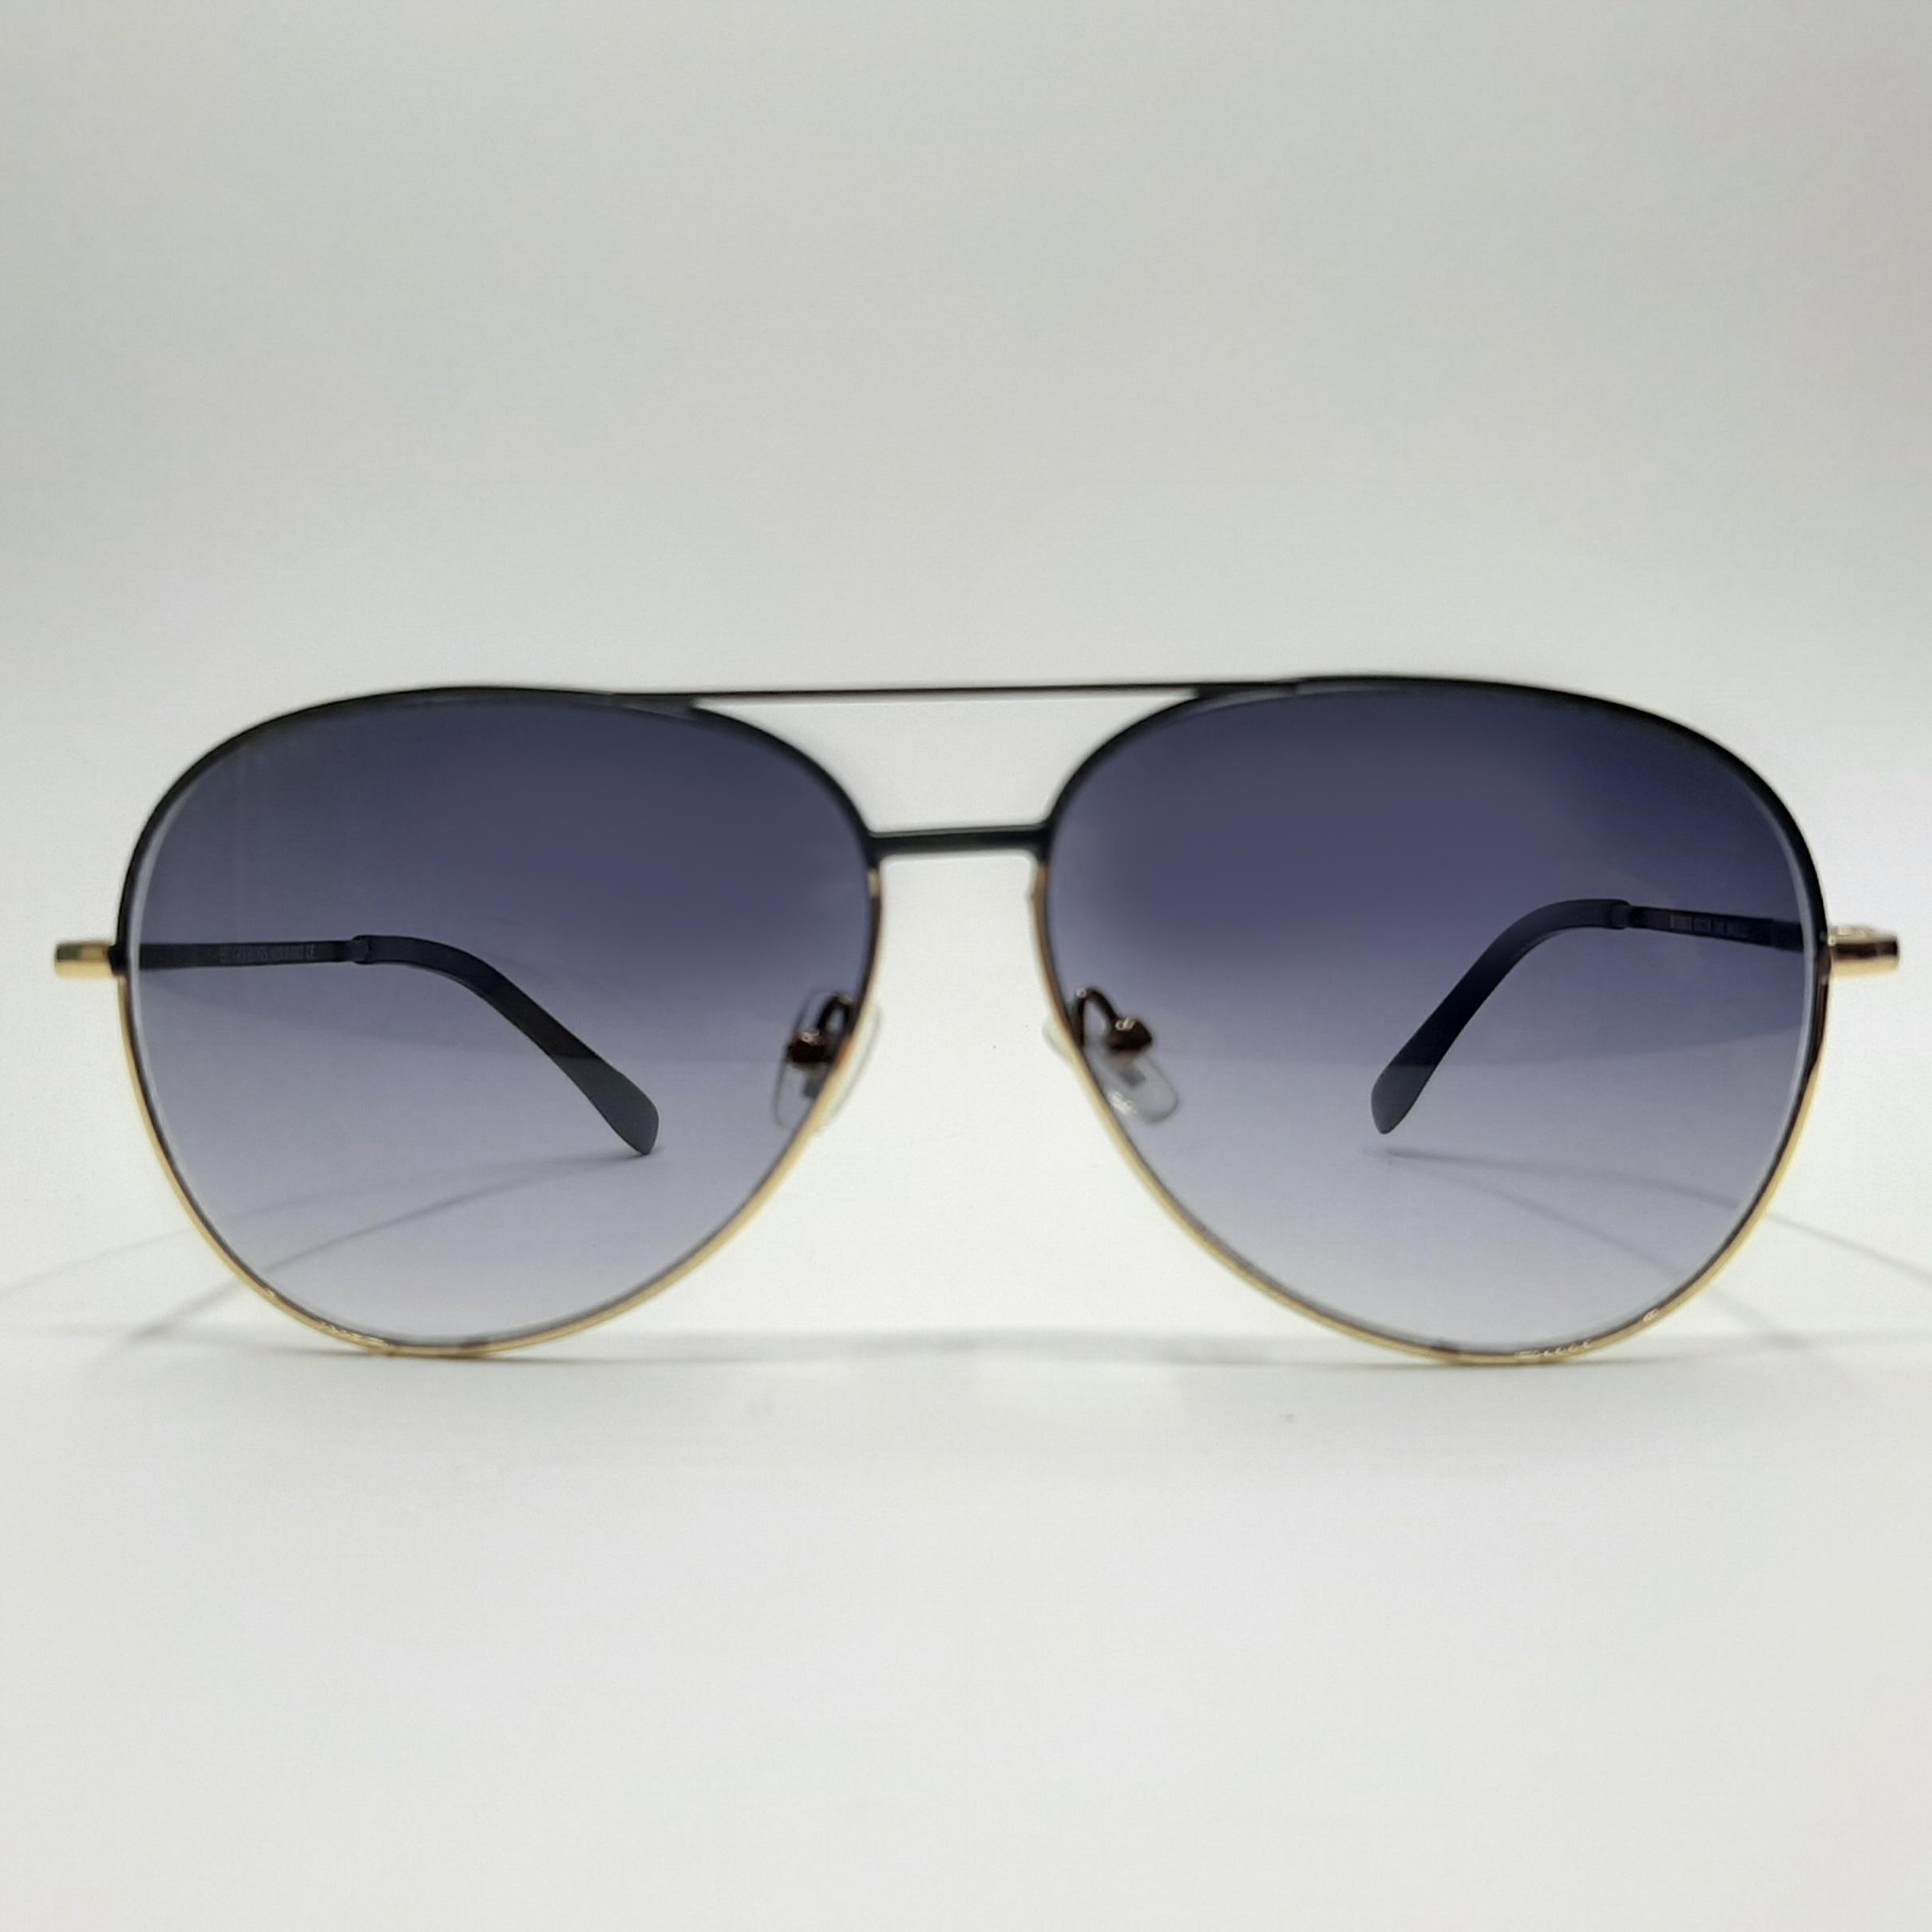 عینک آفتابی هوگو باس مدل B1068Sbks